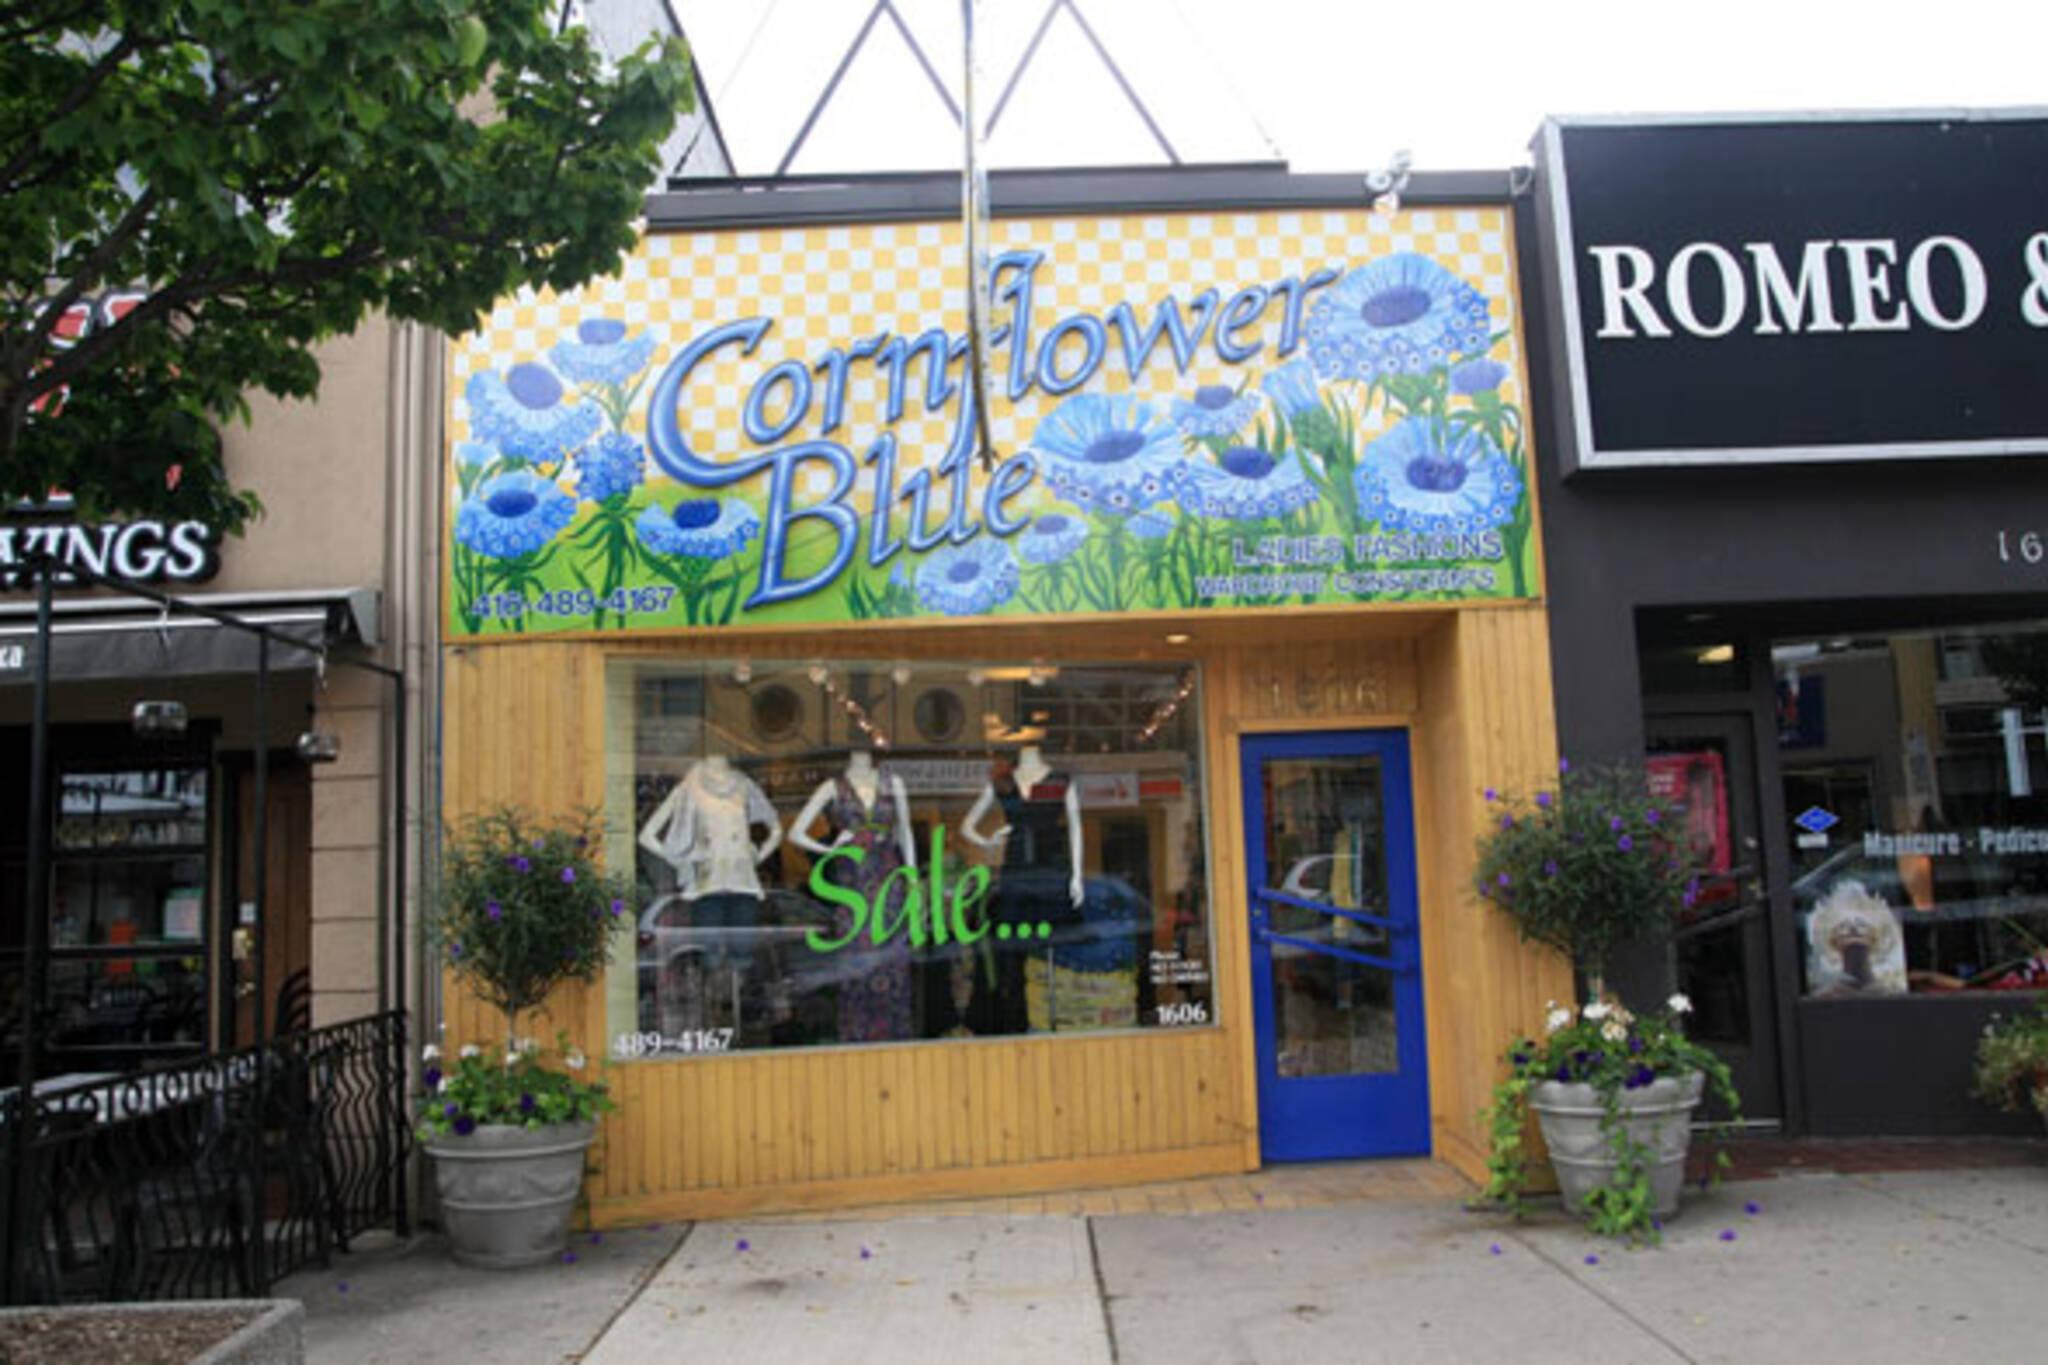 Cornflower Blue Toronto